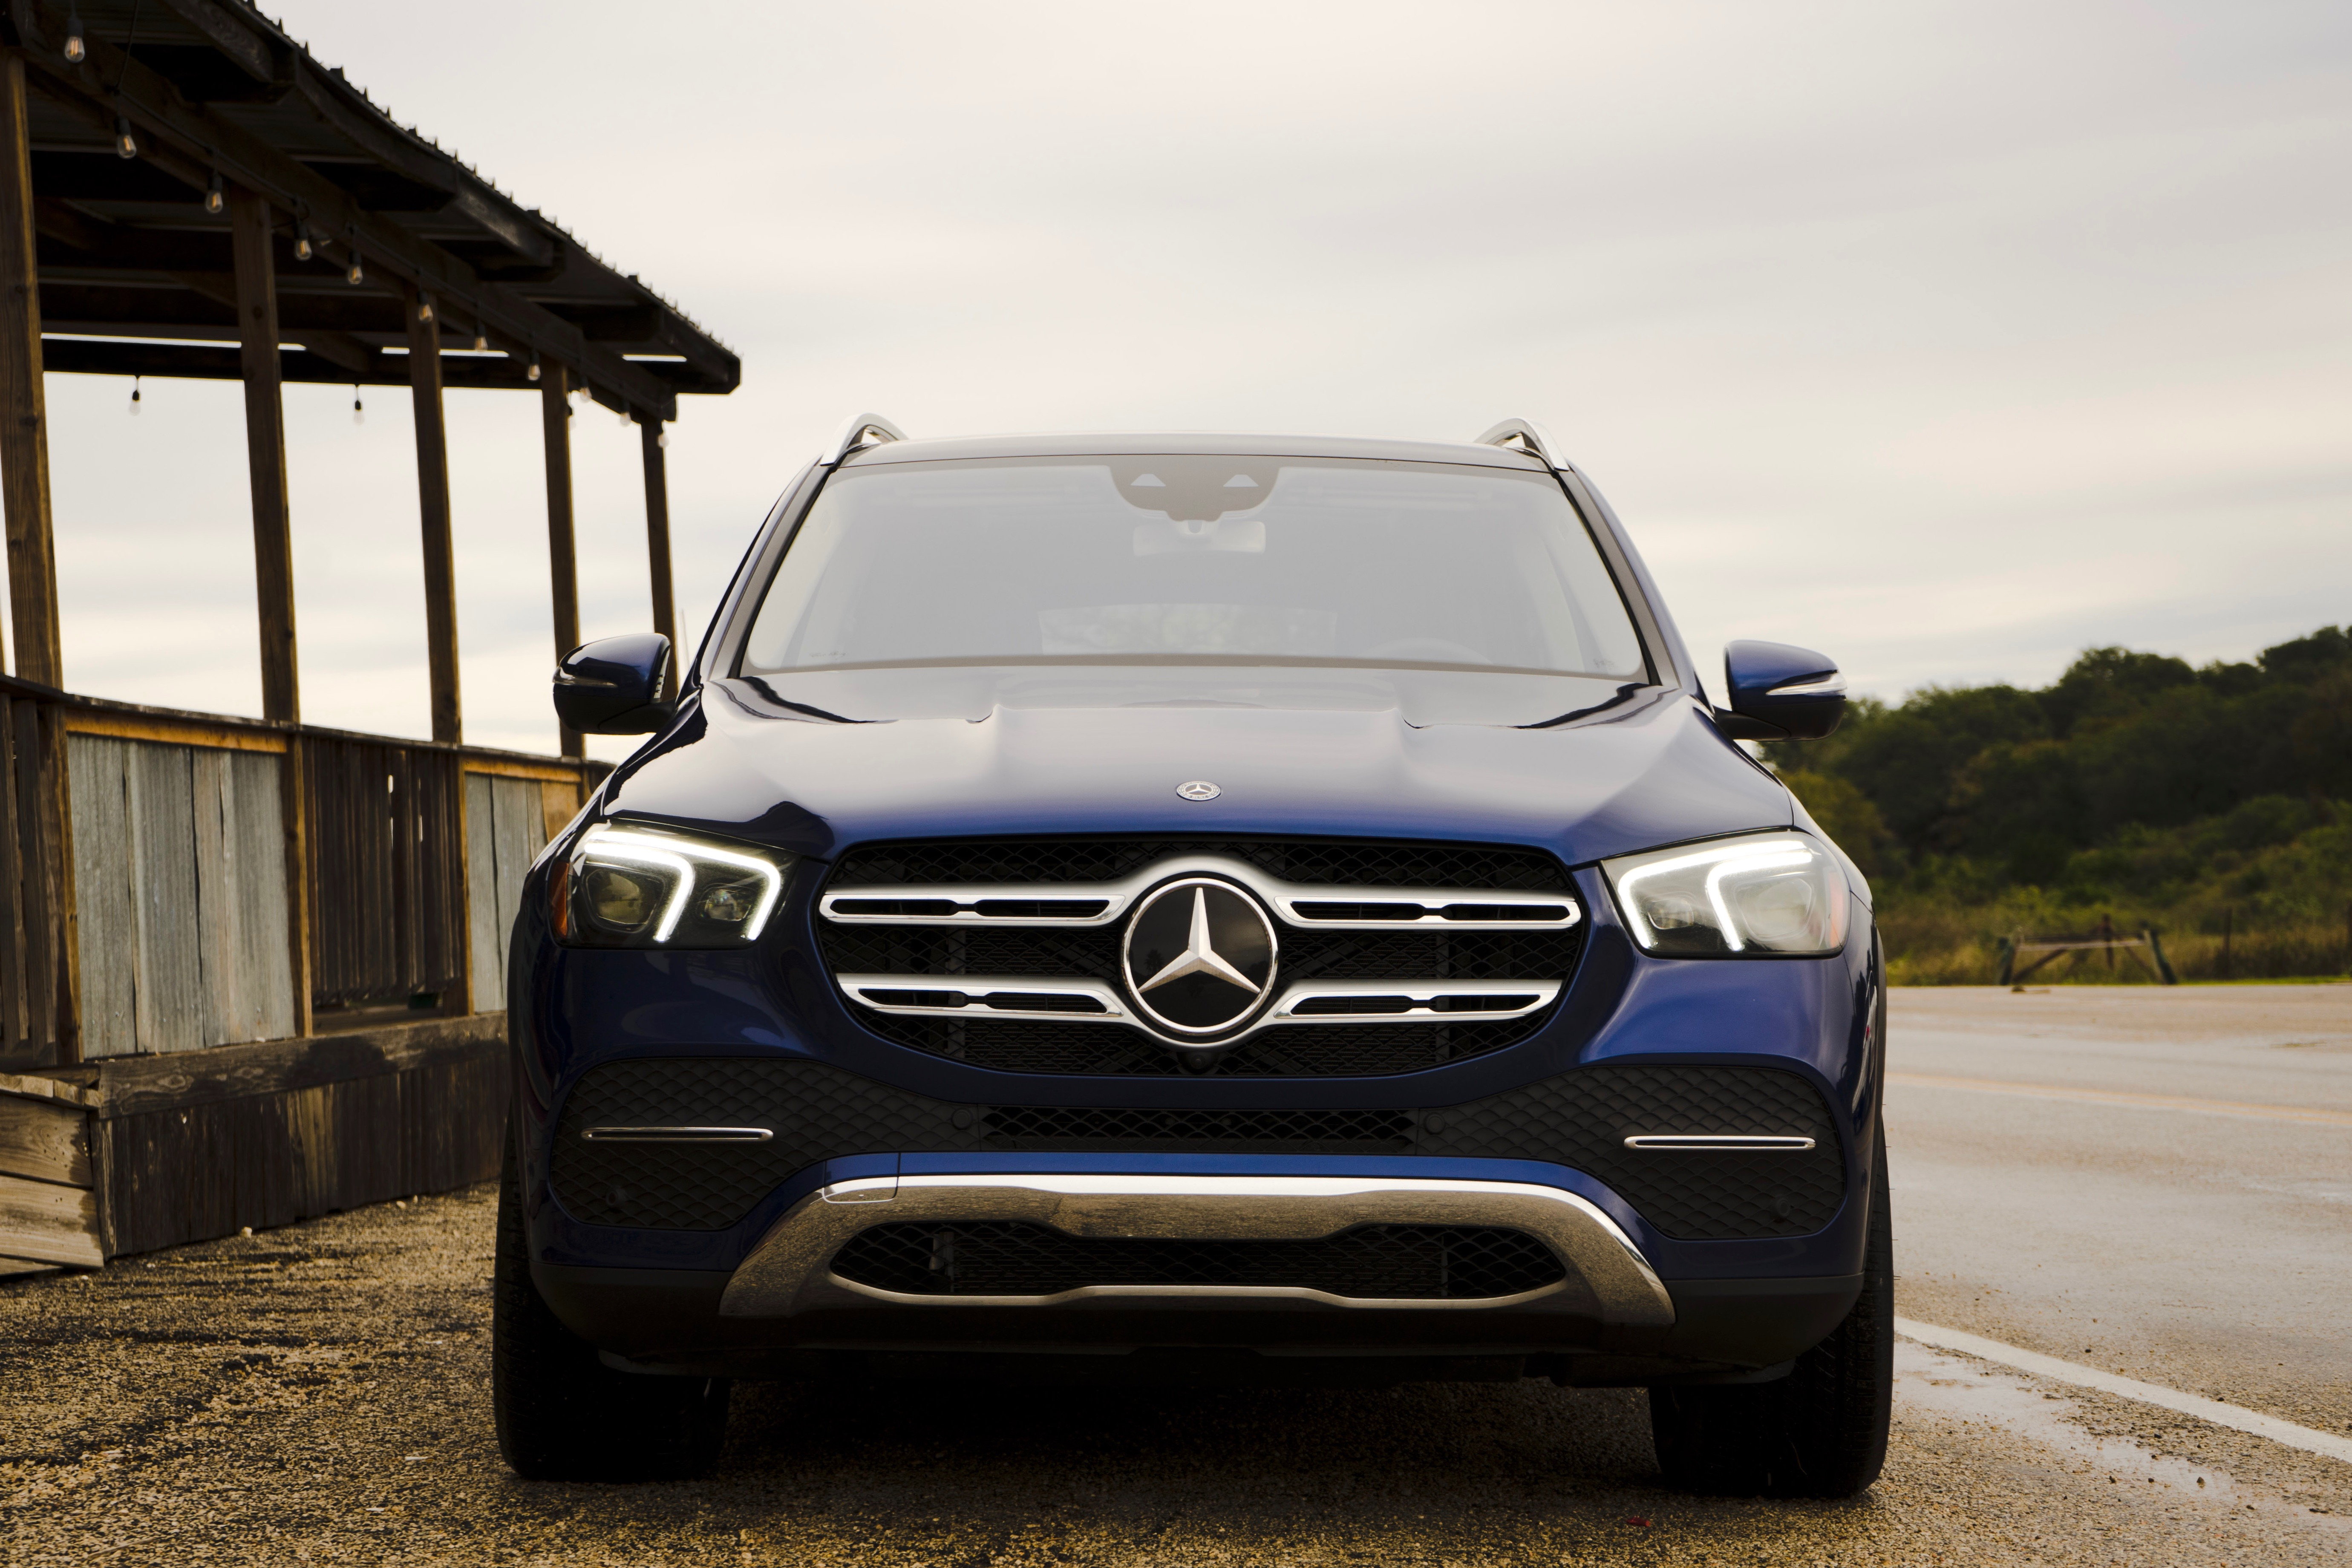 First Drive: 2020 Mercedes-Benz GLE - WHEELS.ca